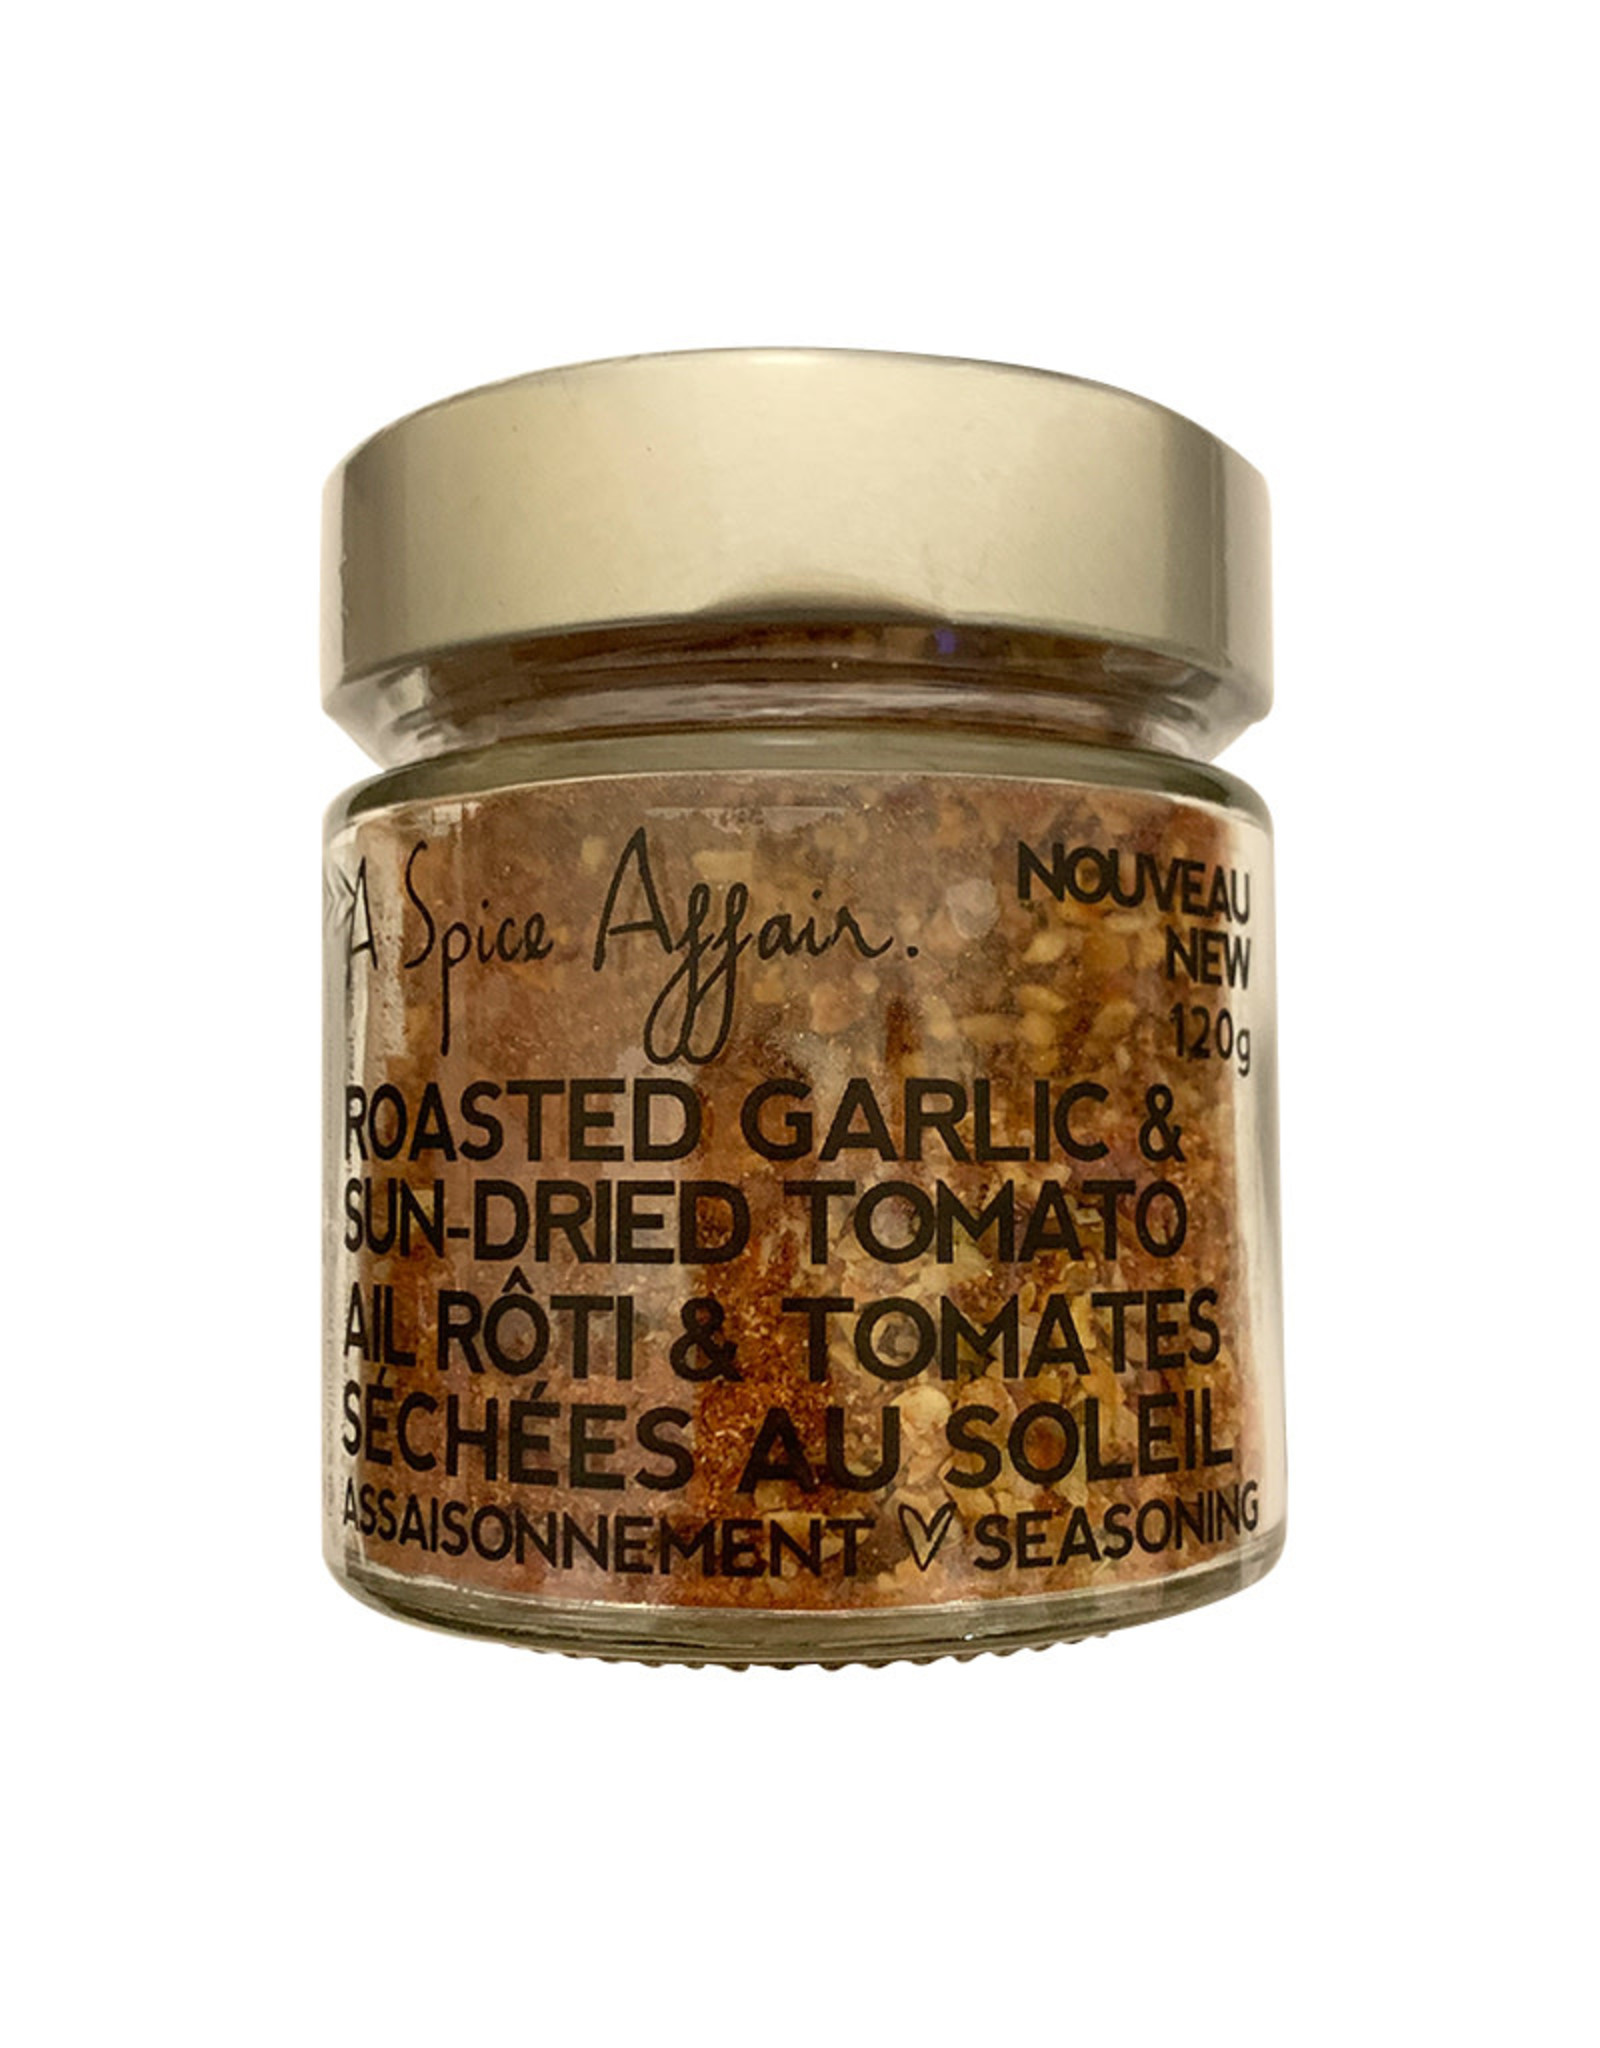 A Spice Affair A Spice Affair - Roasted Garlic & Sun-Dried Tomato